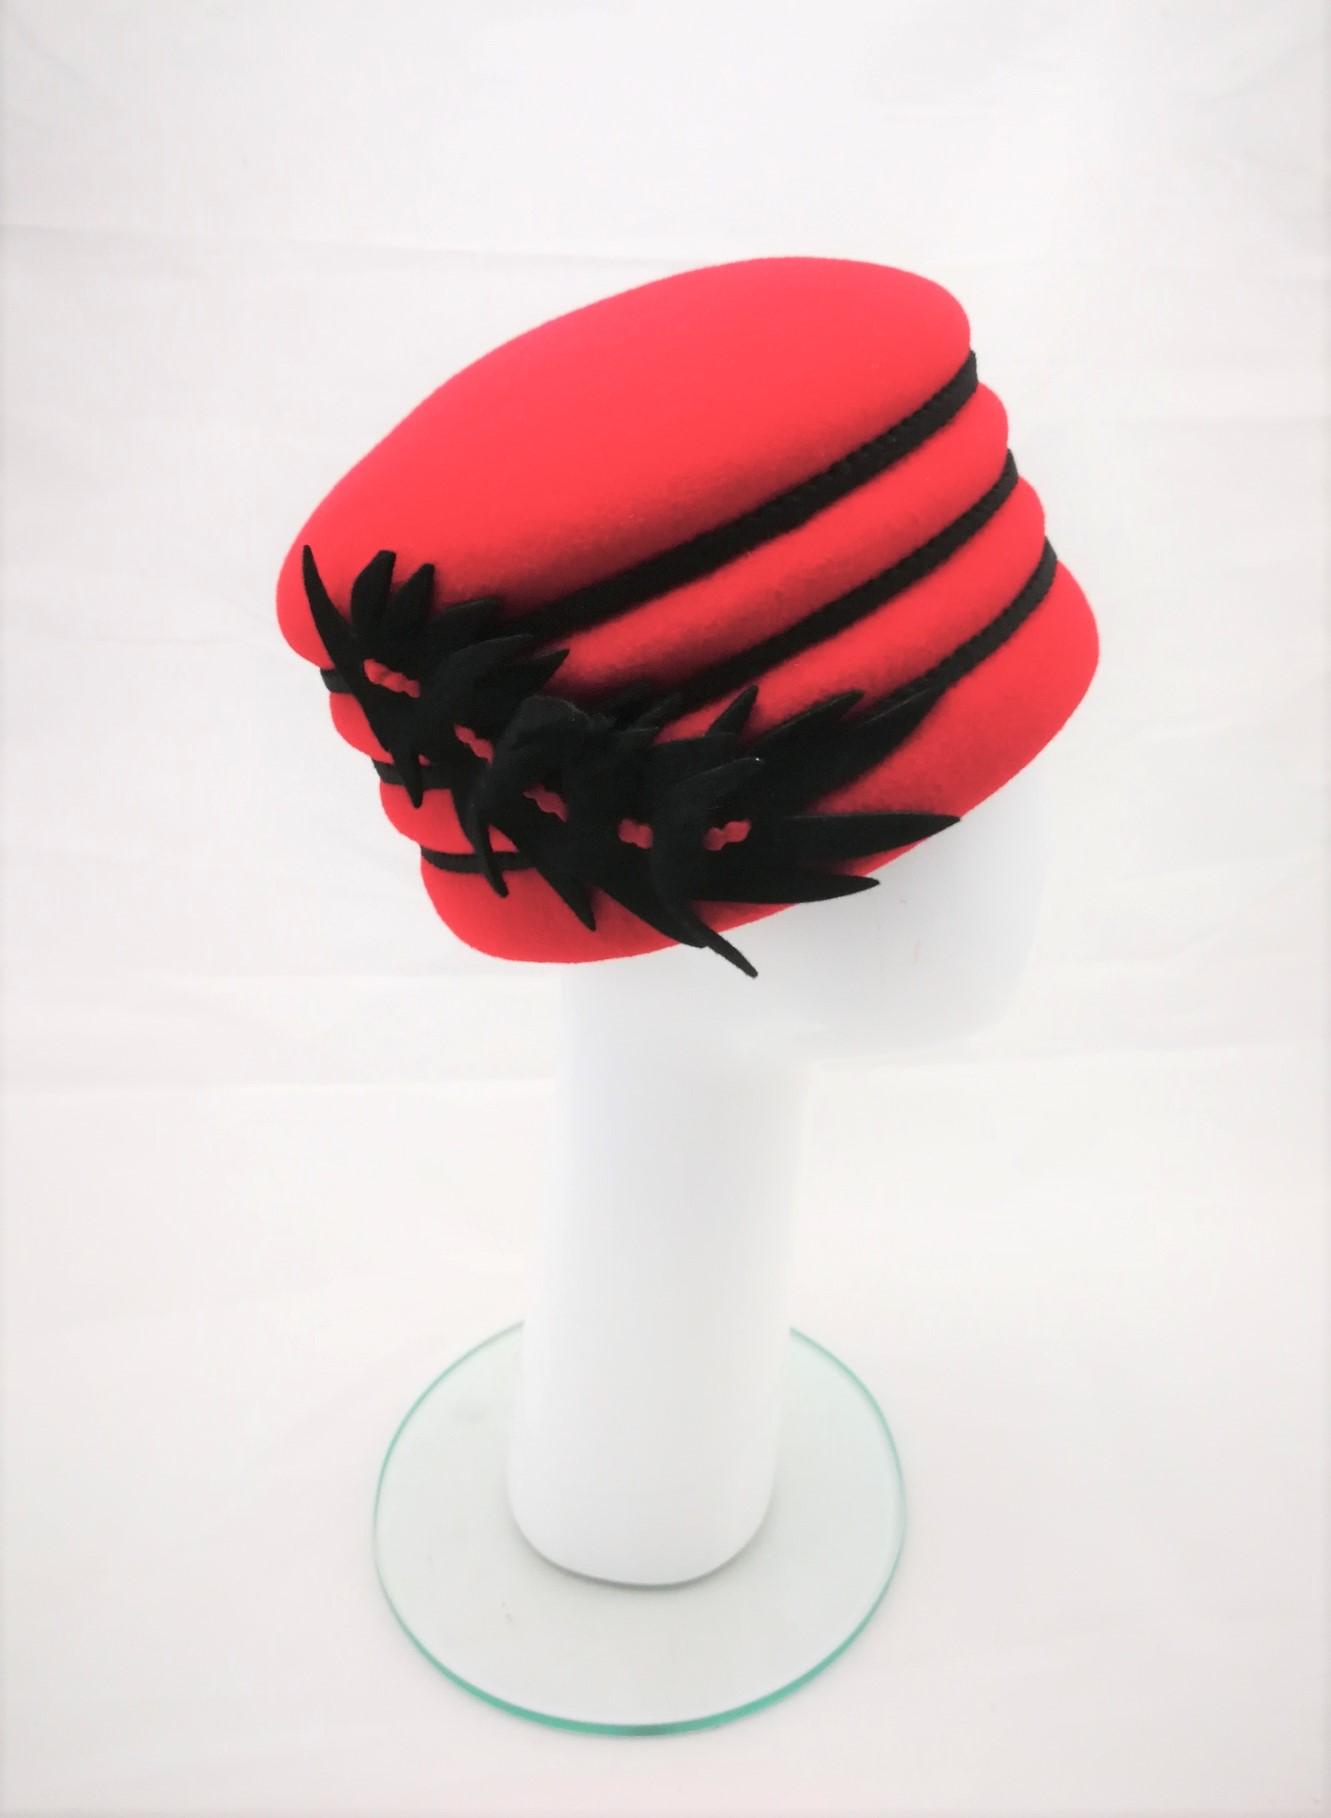 edles Einzelstück, Damenkappe in rot, Haarfilz, 159,90 € Manufakturarbeit - bestellbar